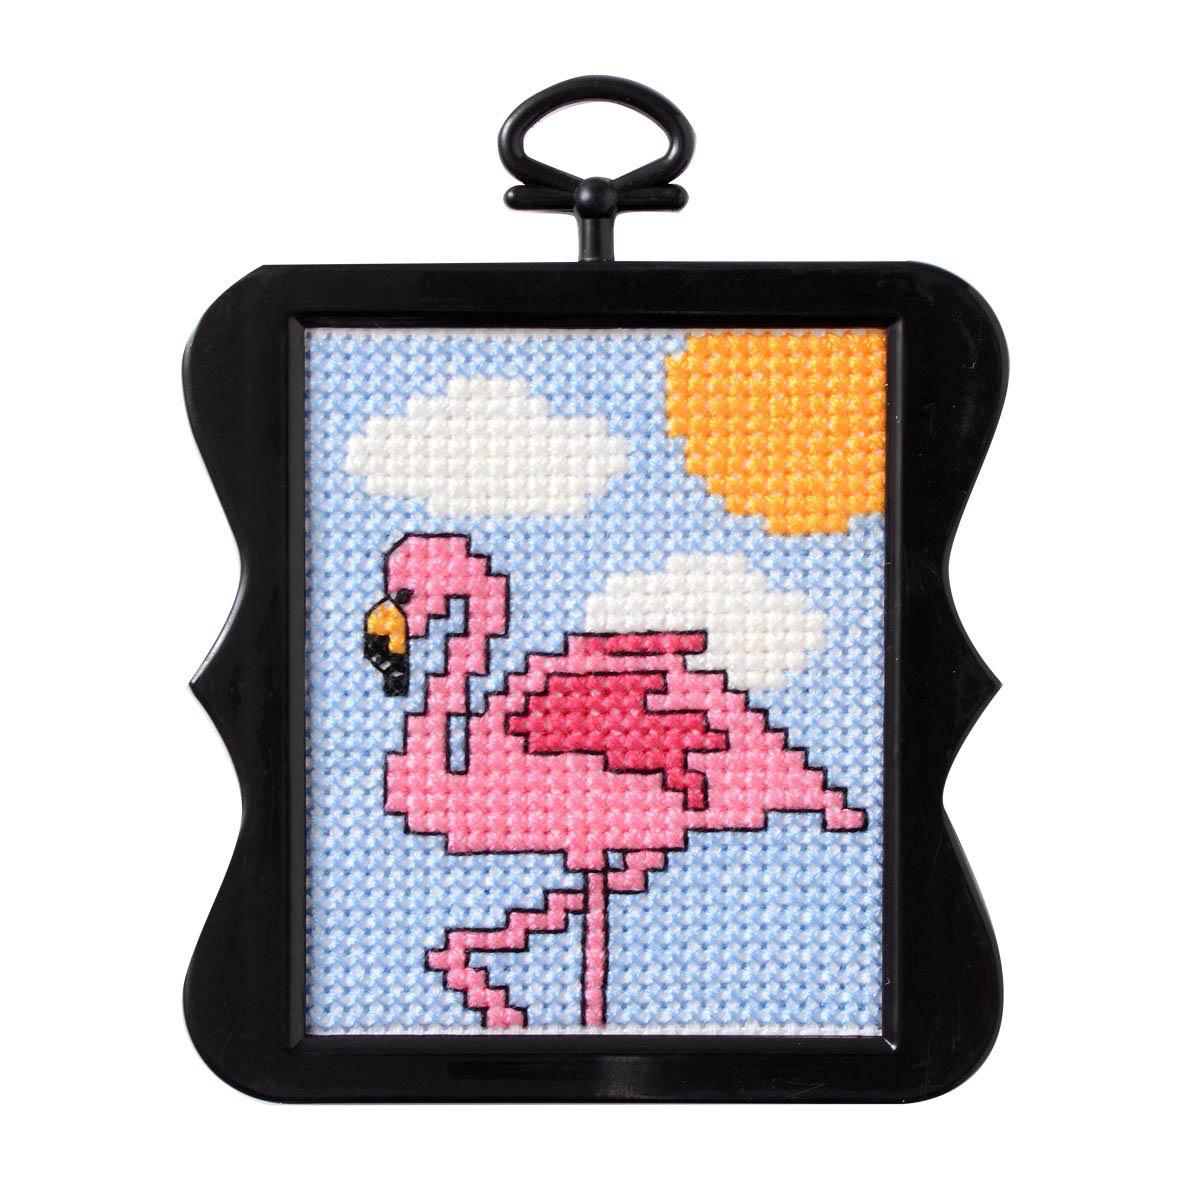 Bucilla ® Counted Cross Stitch - Beginner Stitchery - Mini - Flamingo